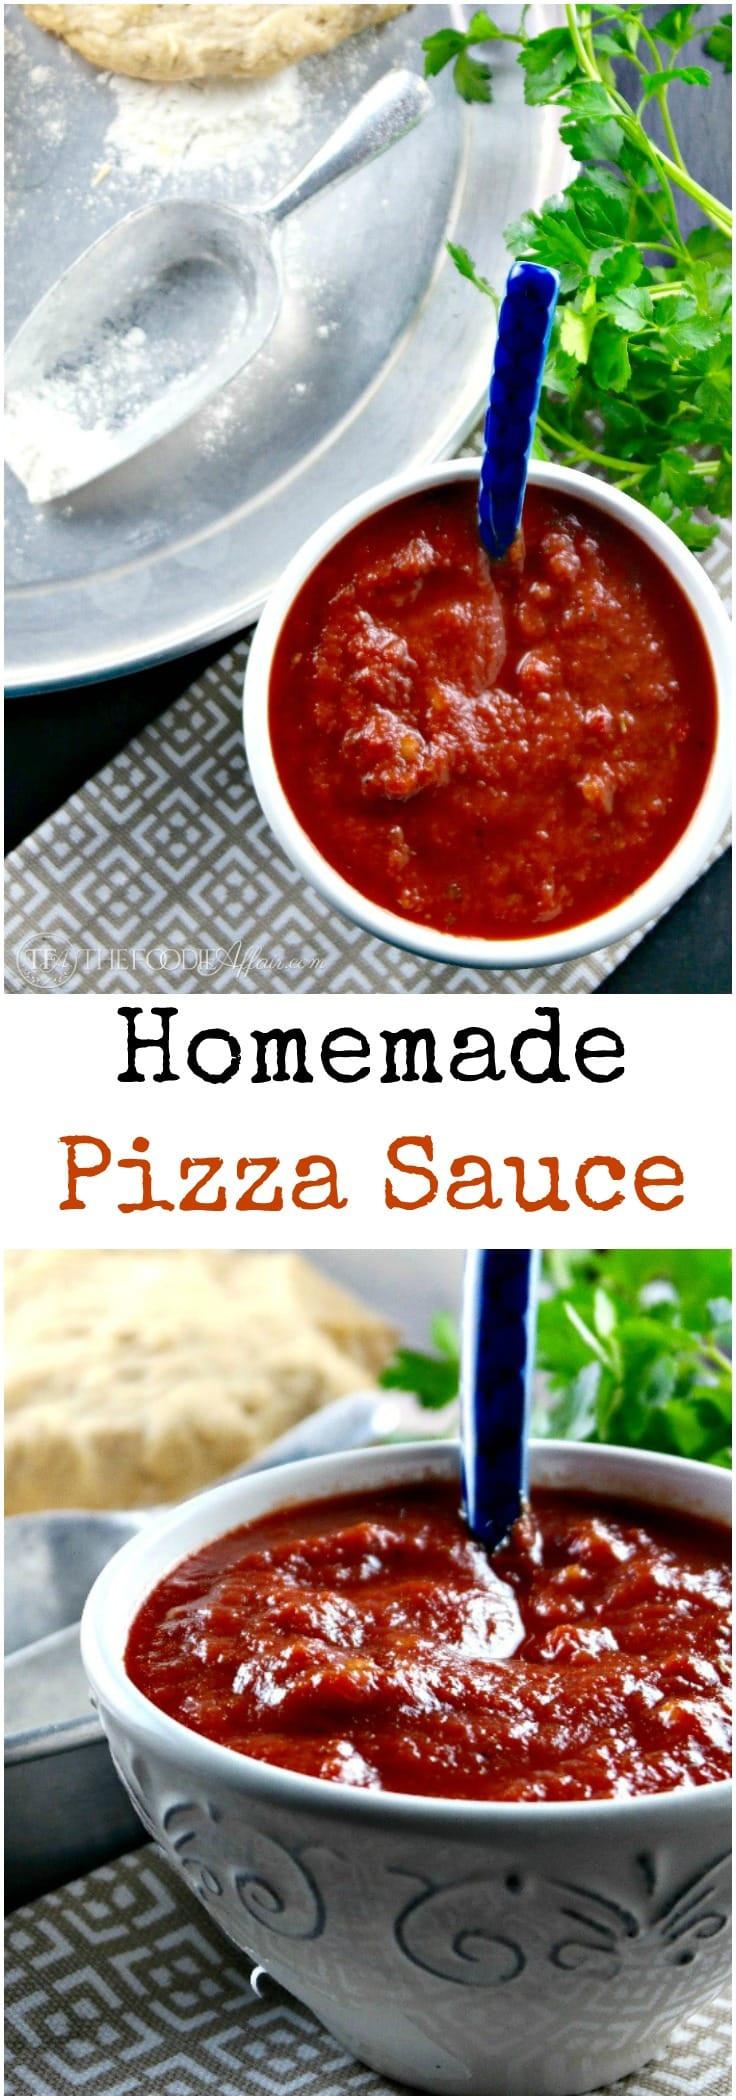 Easy Pizza Sauce Recipe  Homemade Pizza Sauce Recipe